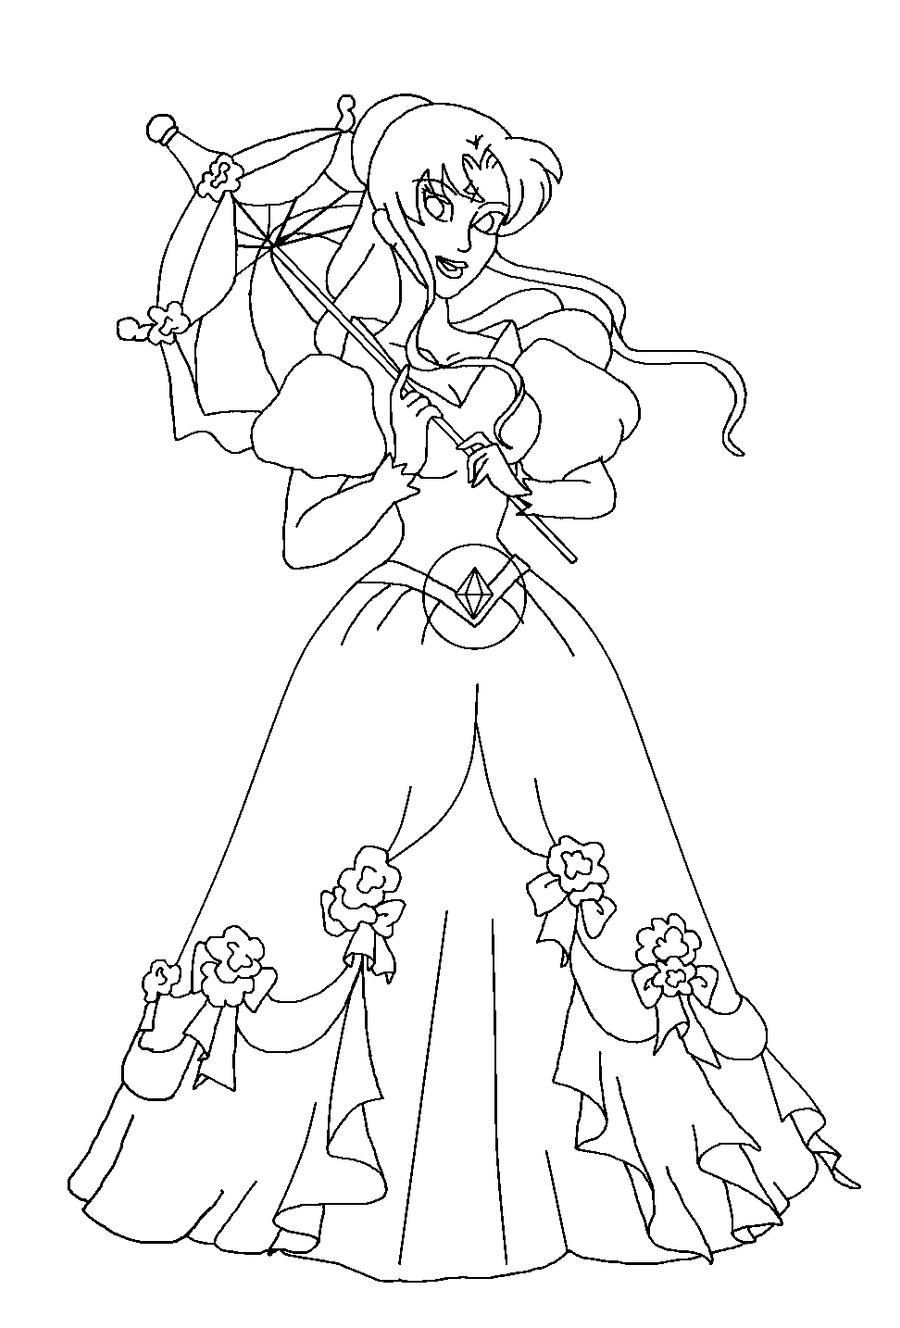 princess jupiter by bnybriek on deviantart